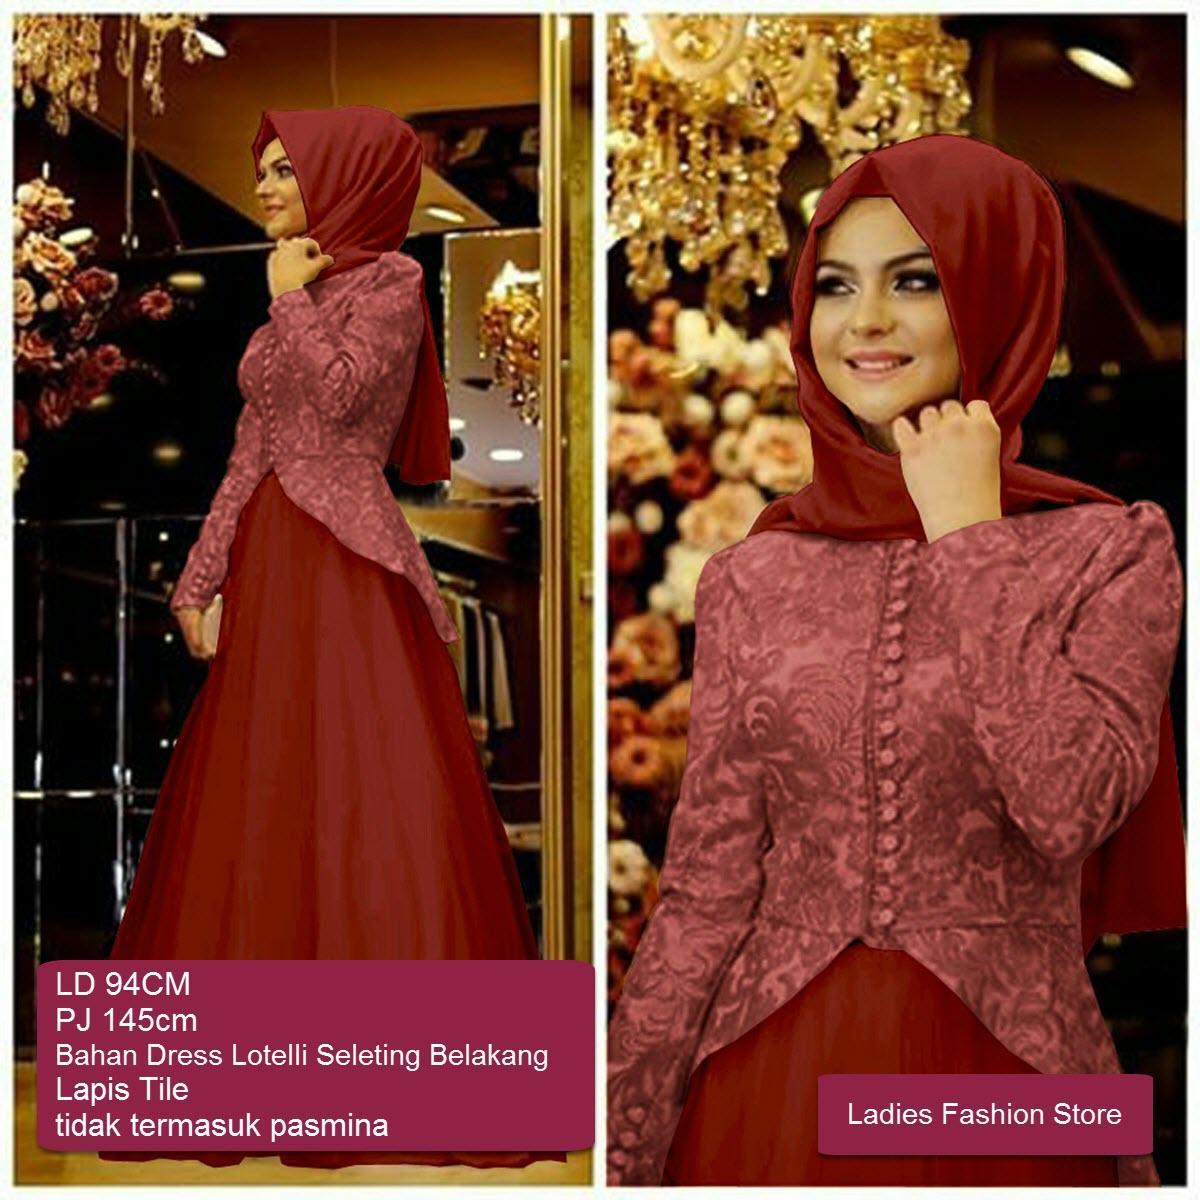 LF Dress Muslimah Panjang / Terusan Gamis Lebaran Terbaru 2018 / Setelan Gamis Wanita Murah dan Bagus / Gamis Syari Syar'i / Baju Muslim Murah / Dress Pesta Pernikahan / Pakaian Muslim Terkini / Hijab Wanita Model Baru / Gamis Cantik (lemasa) SS MARUN